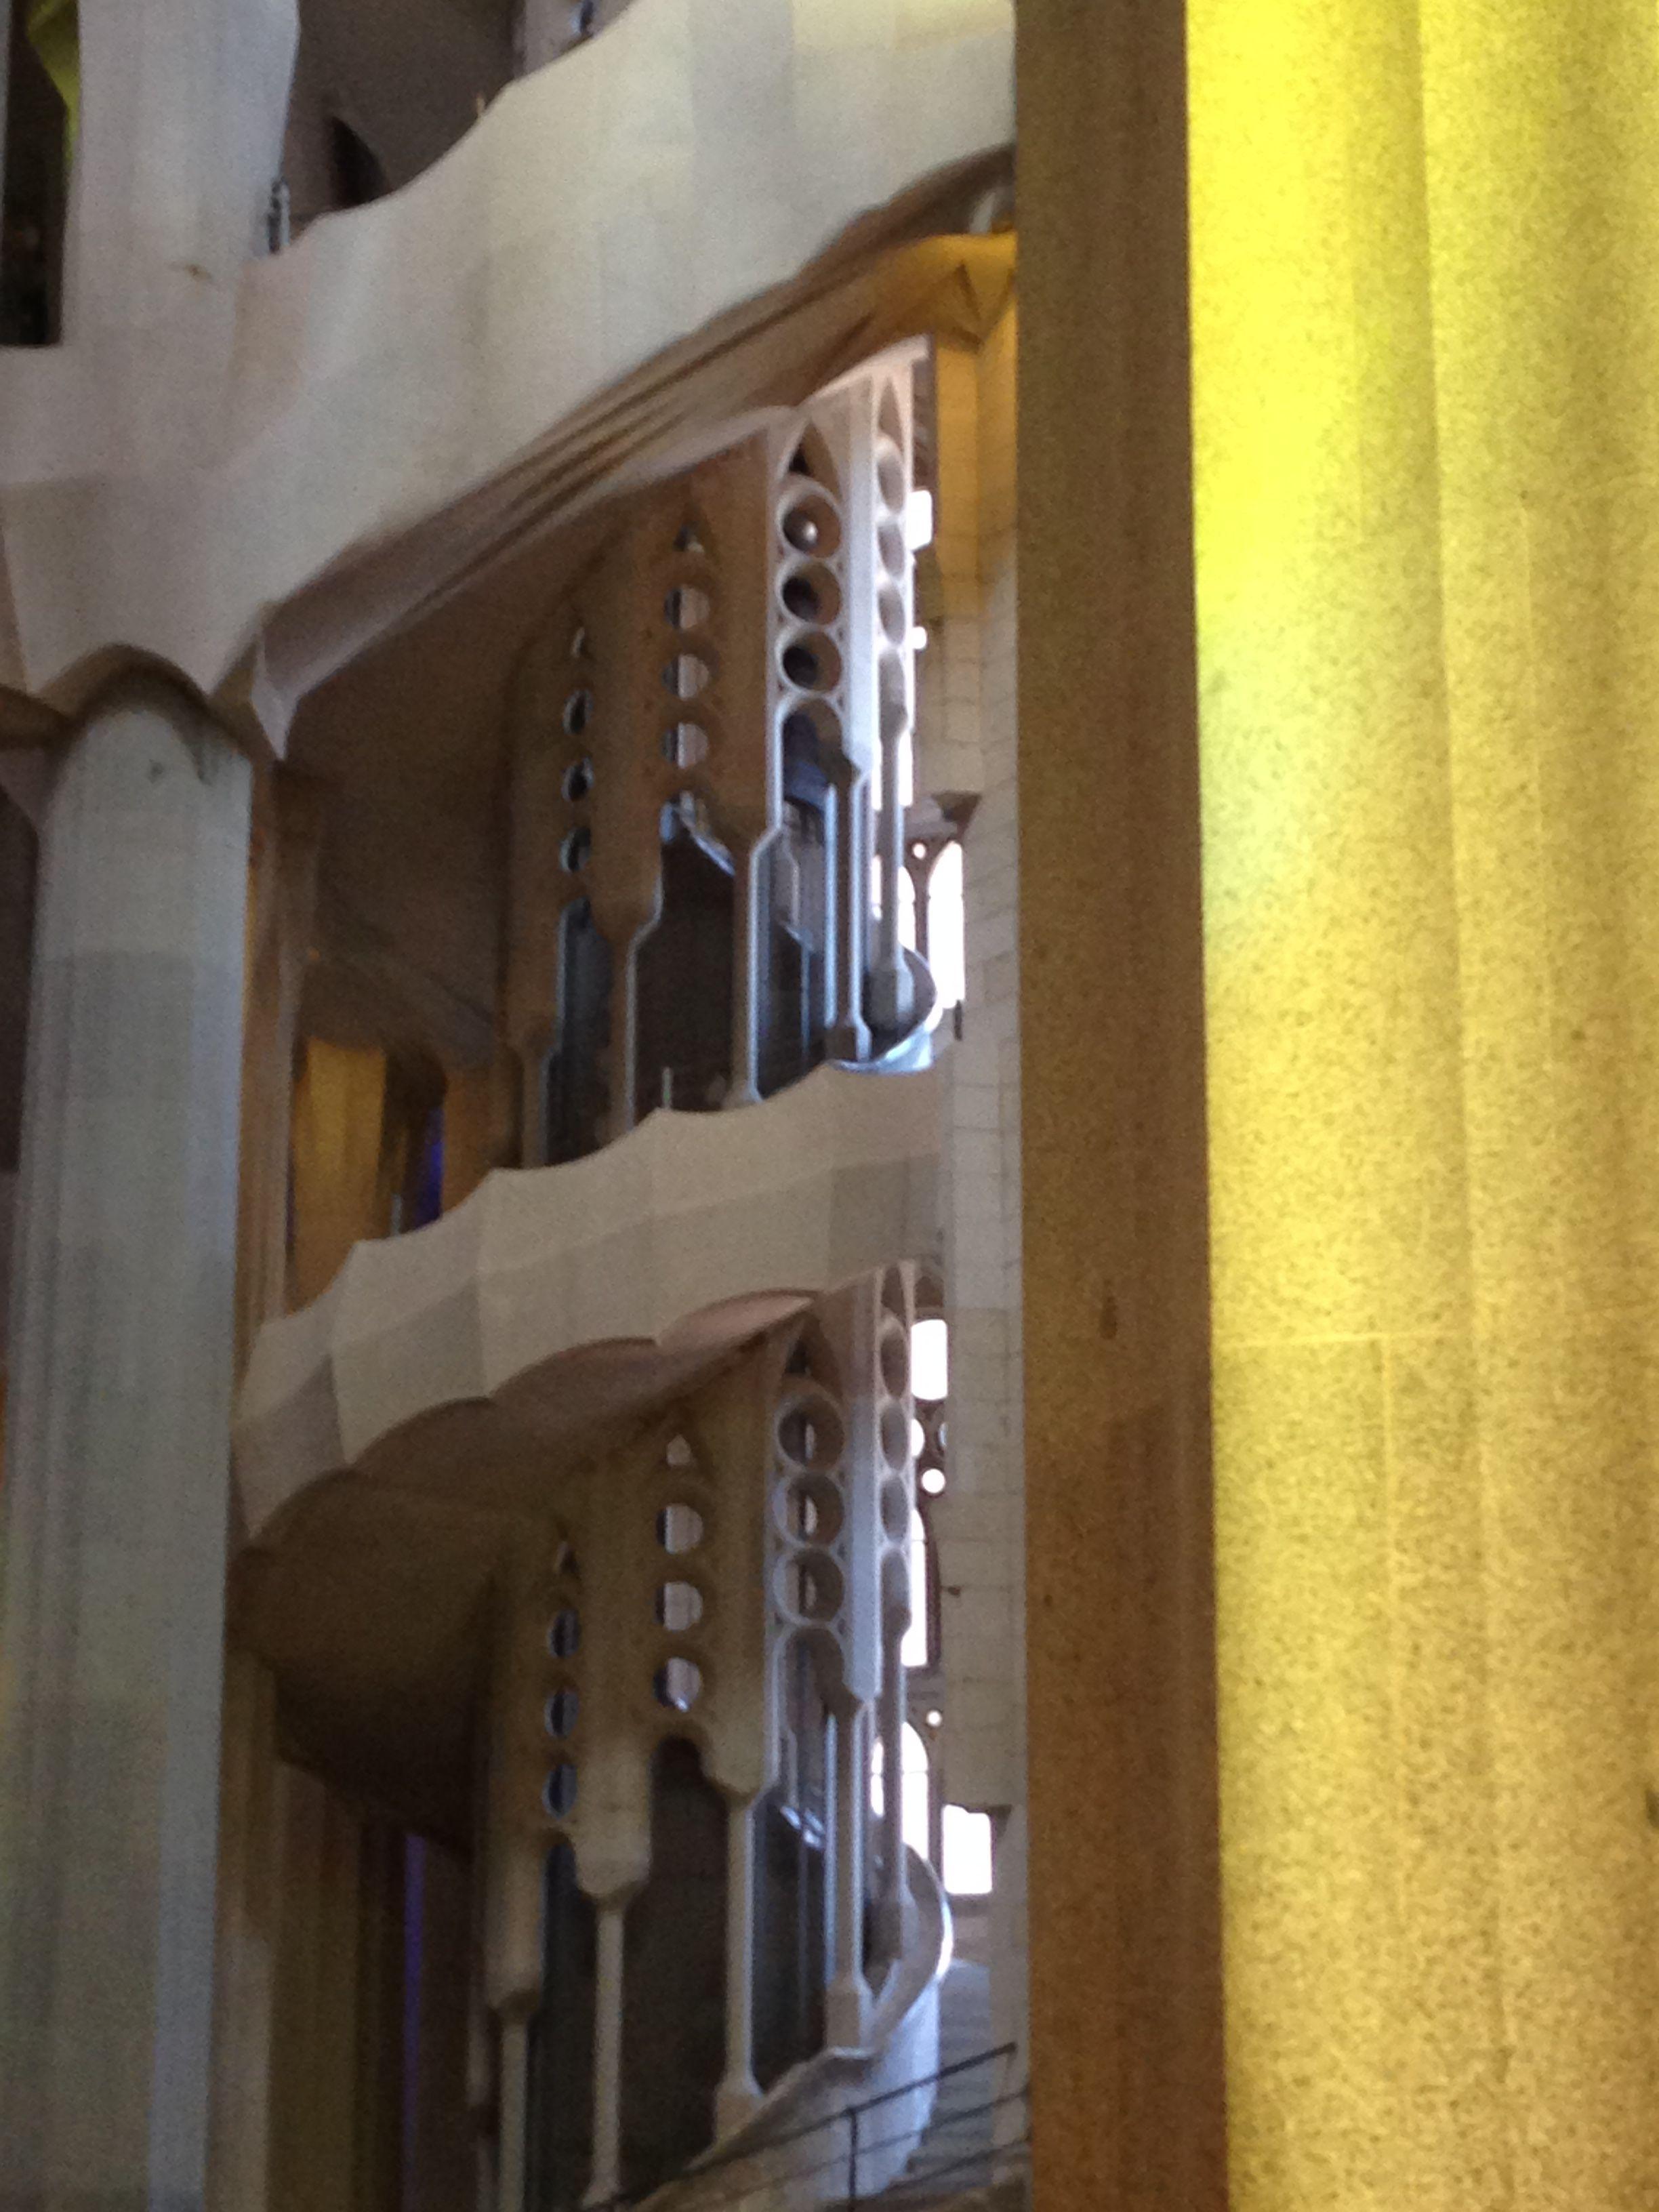 Detail from Gaudi's Sagrada Familia, Barcelona, Spain